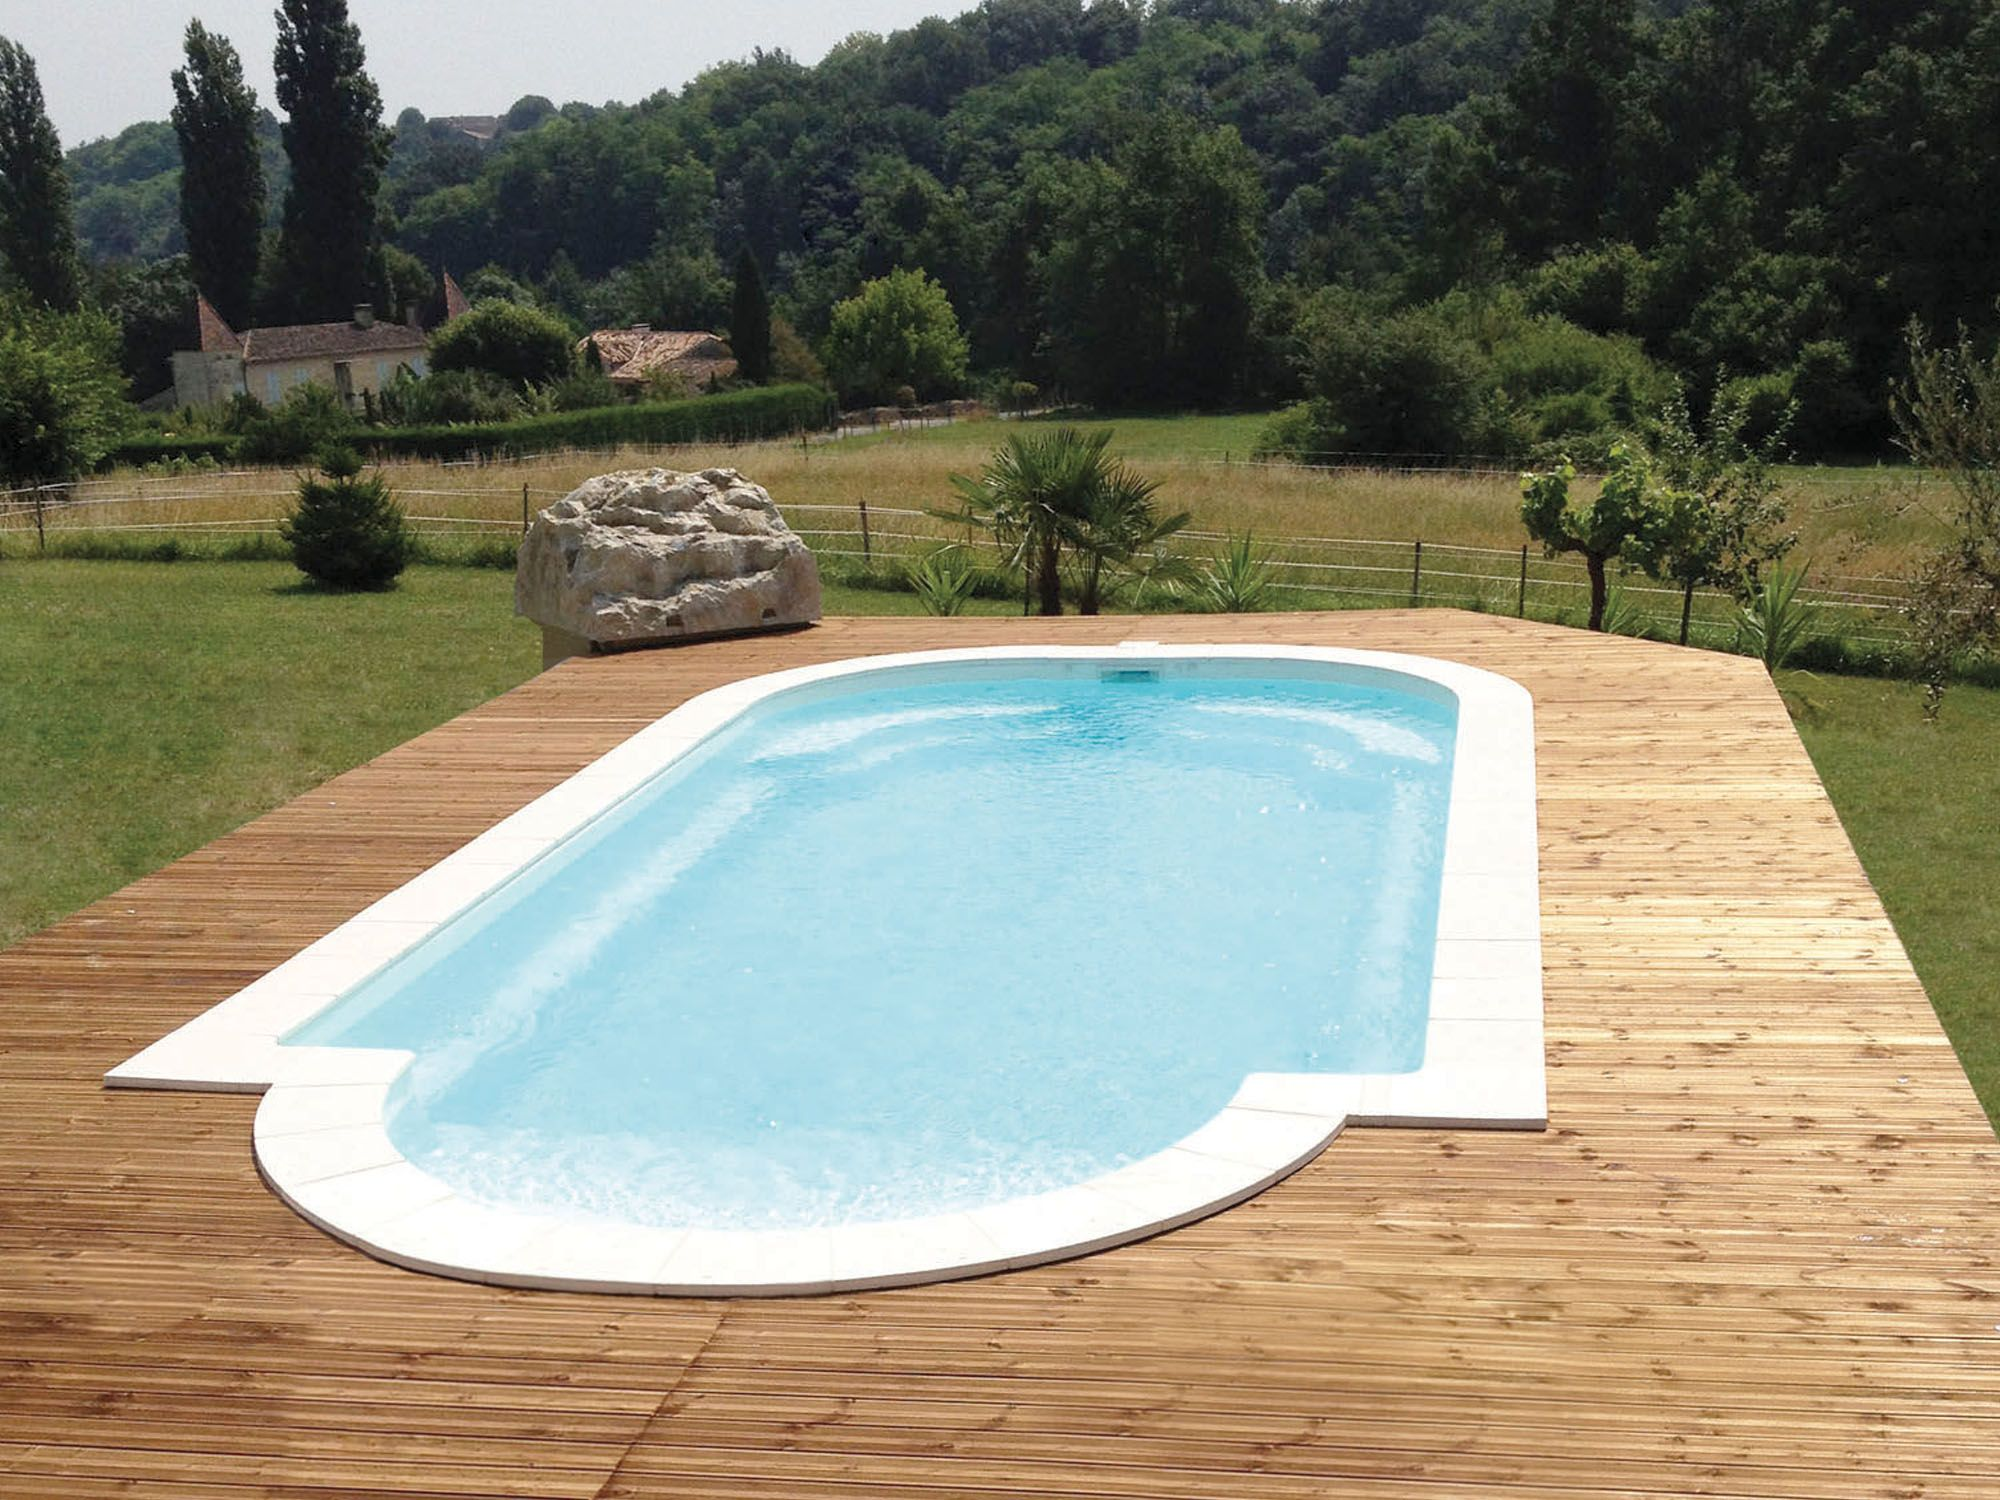 piscine coque polyester bolero fabrication francaise